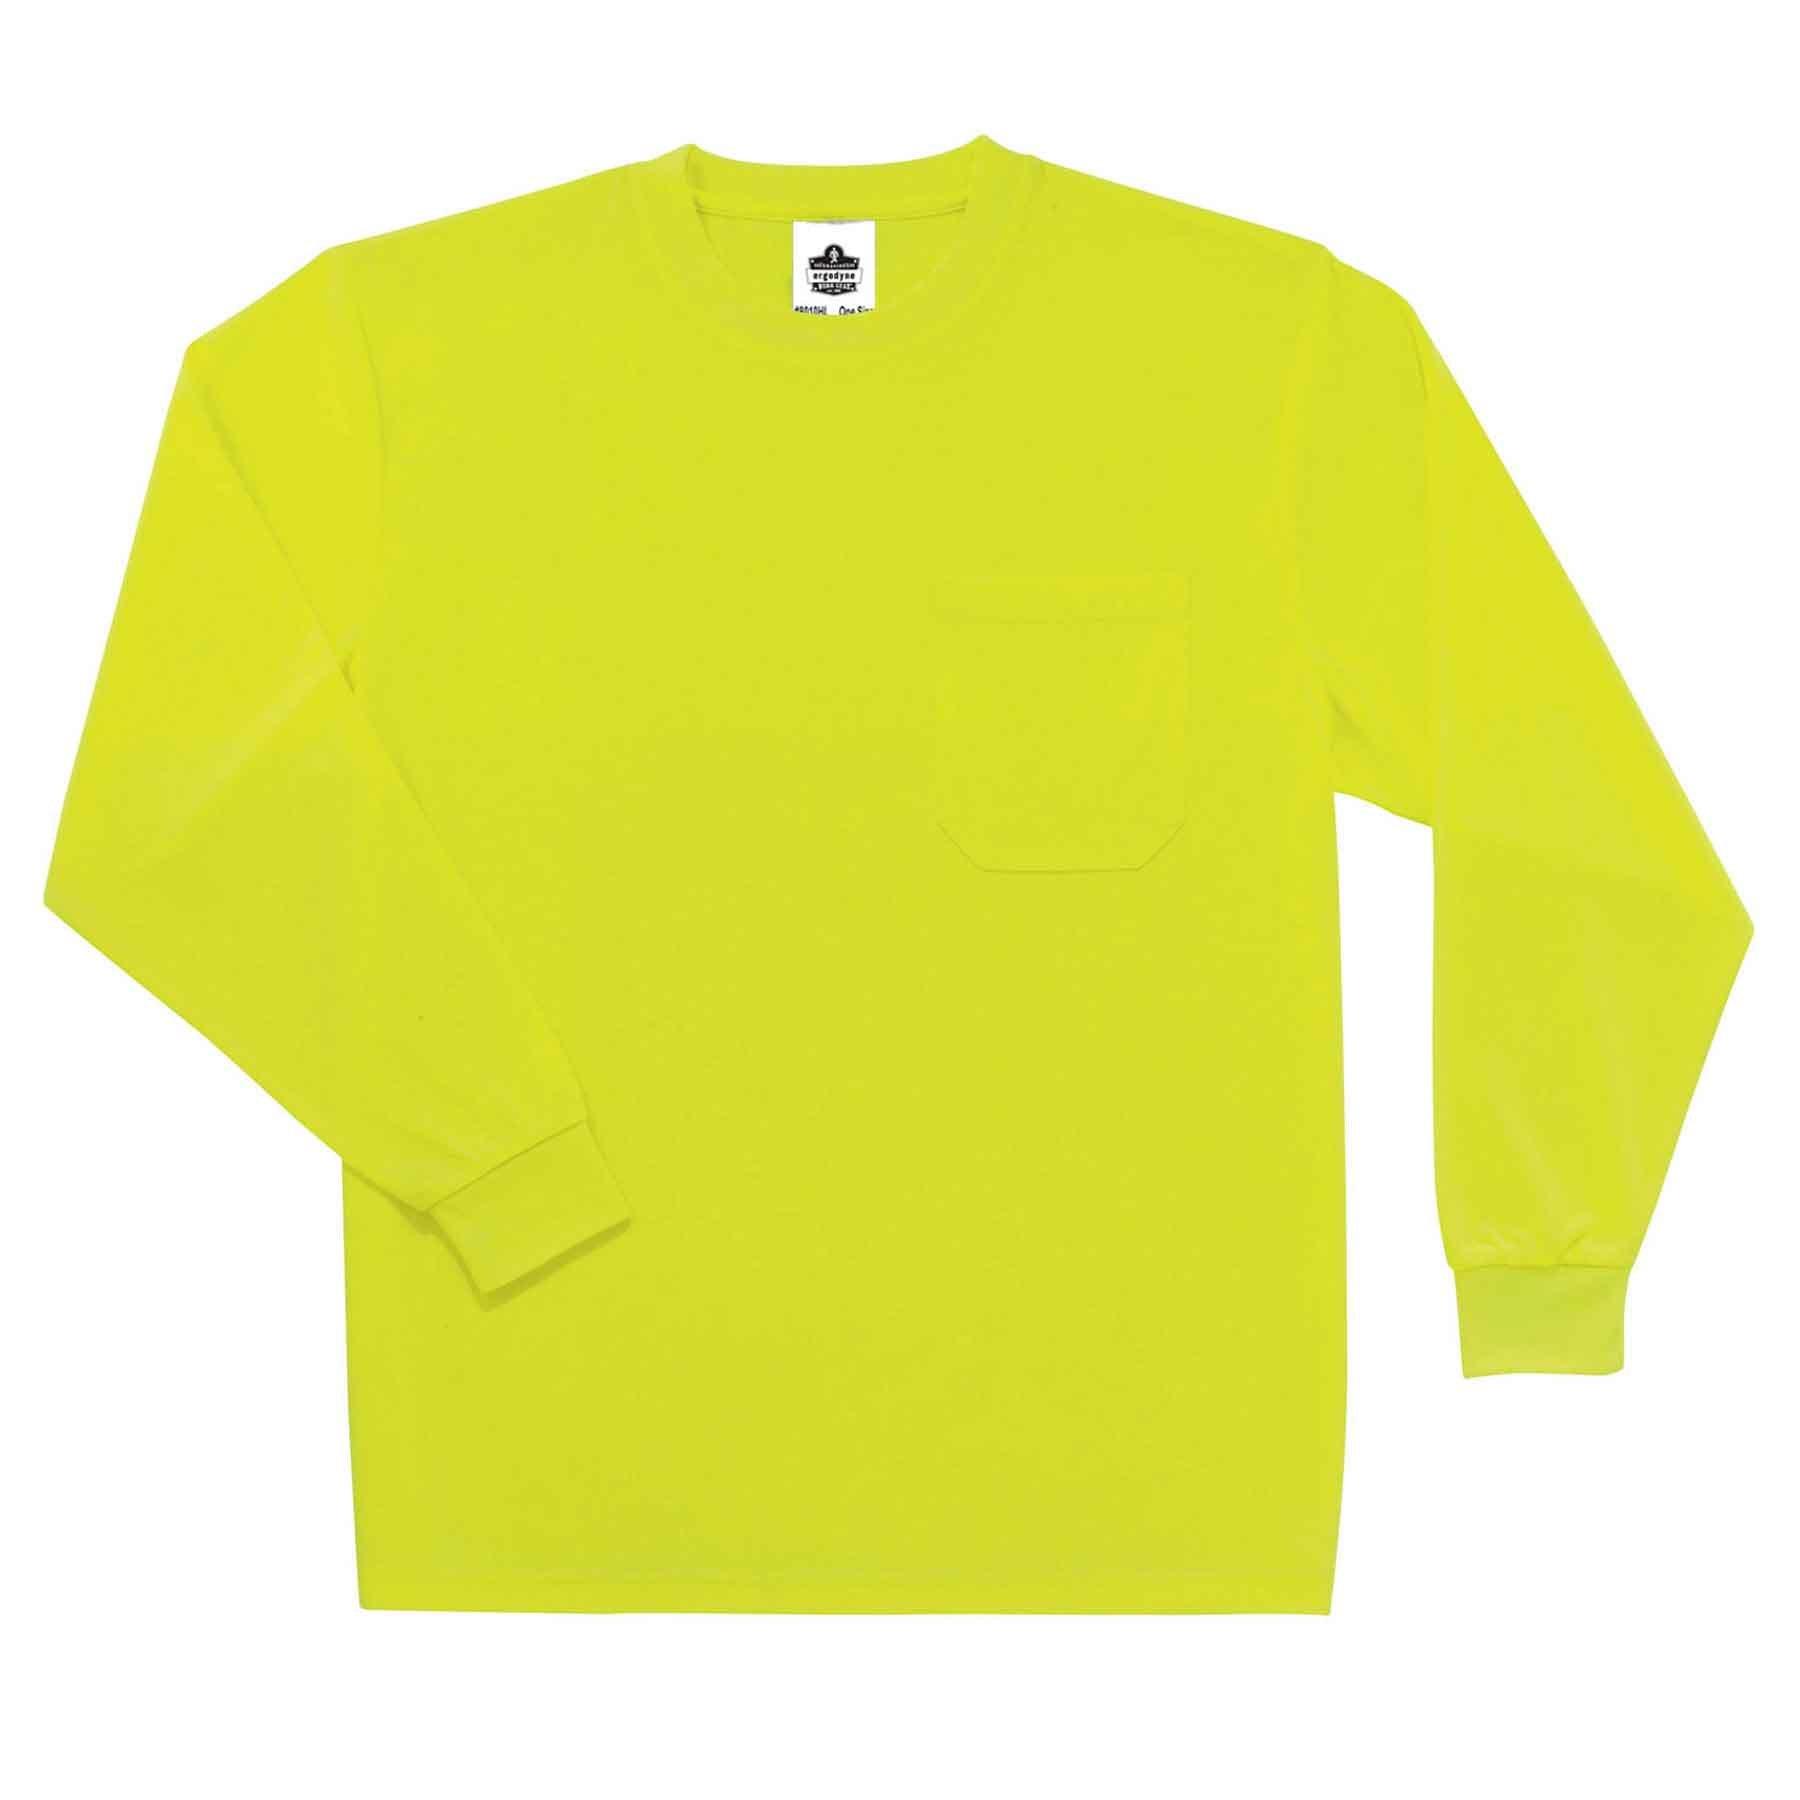 Ergodyne GloWear 8091 Non-Certified High Visibility Long Sleeve T-Shirt, Small, Lime